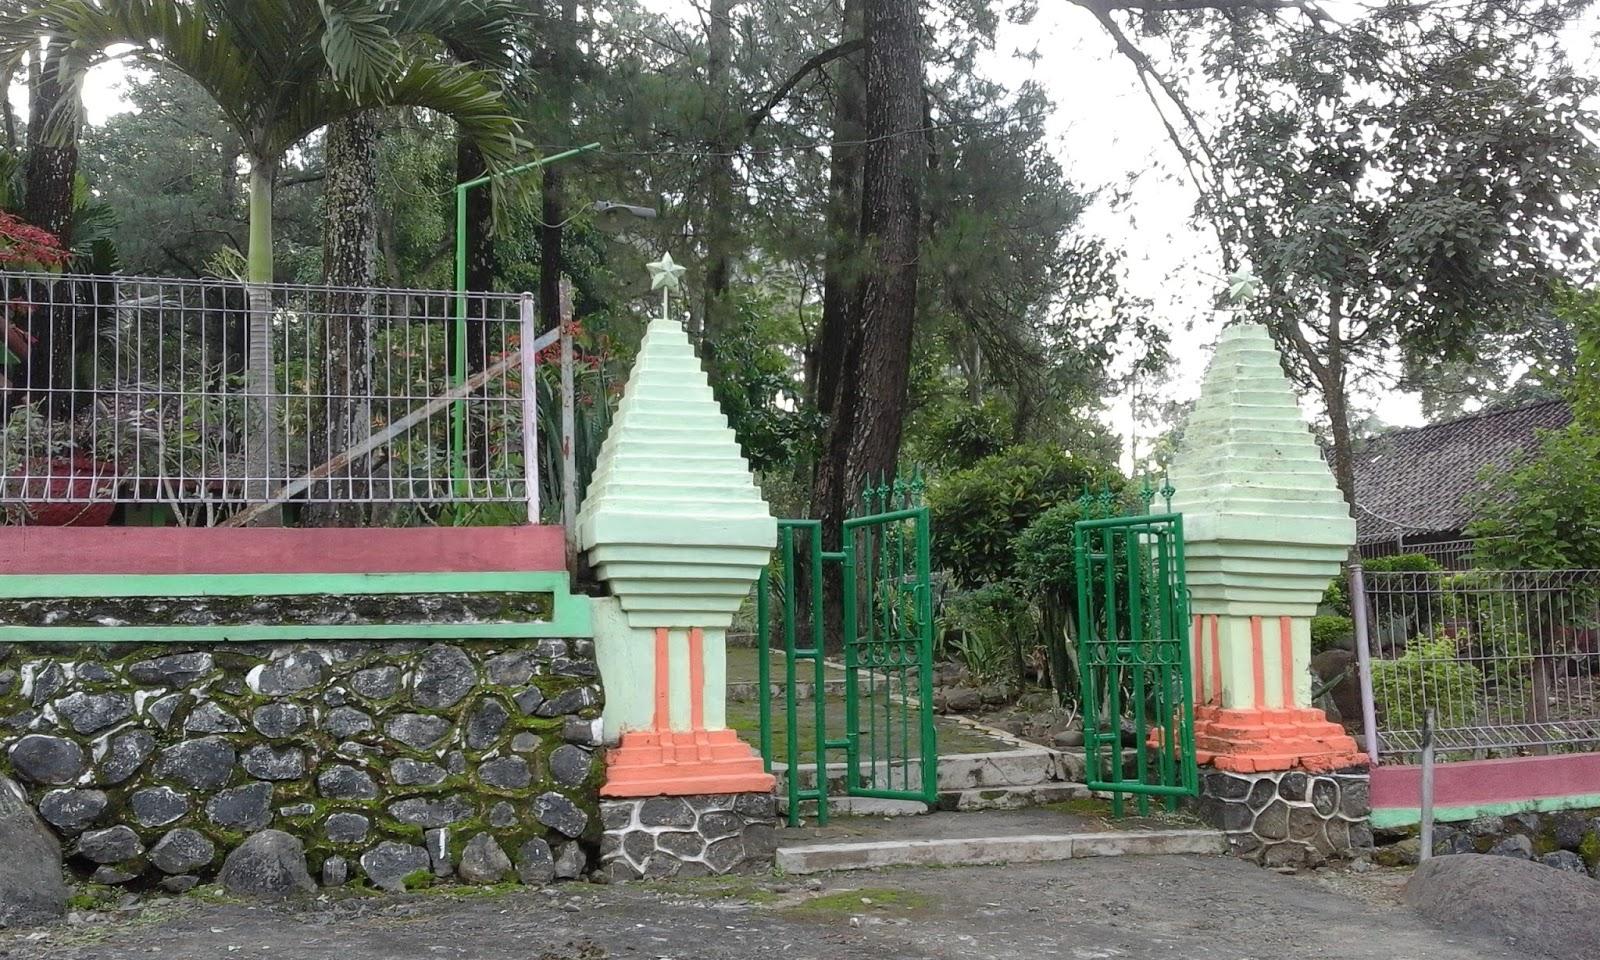 Petilasan Jendral Sudirman Kota Kabupaten Nganjuk Wisata Tempat Beribadah Disana